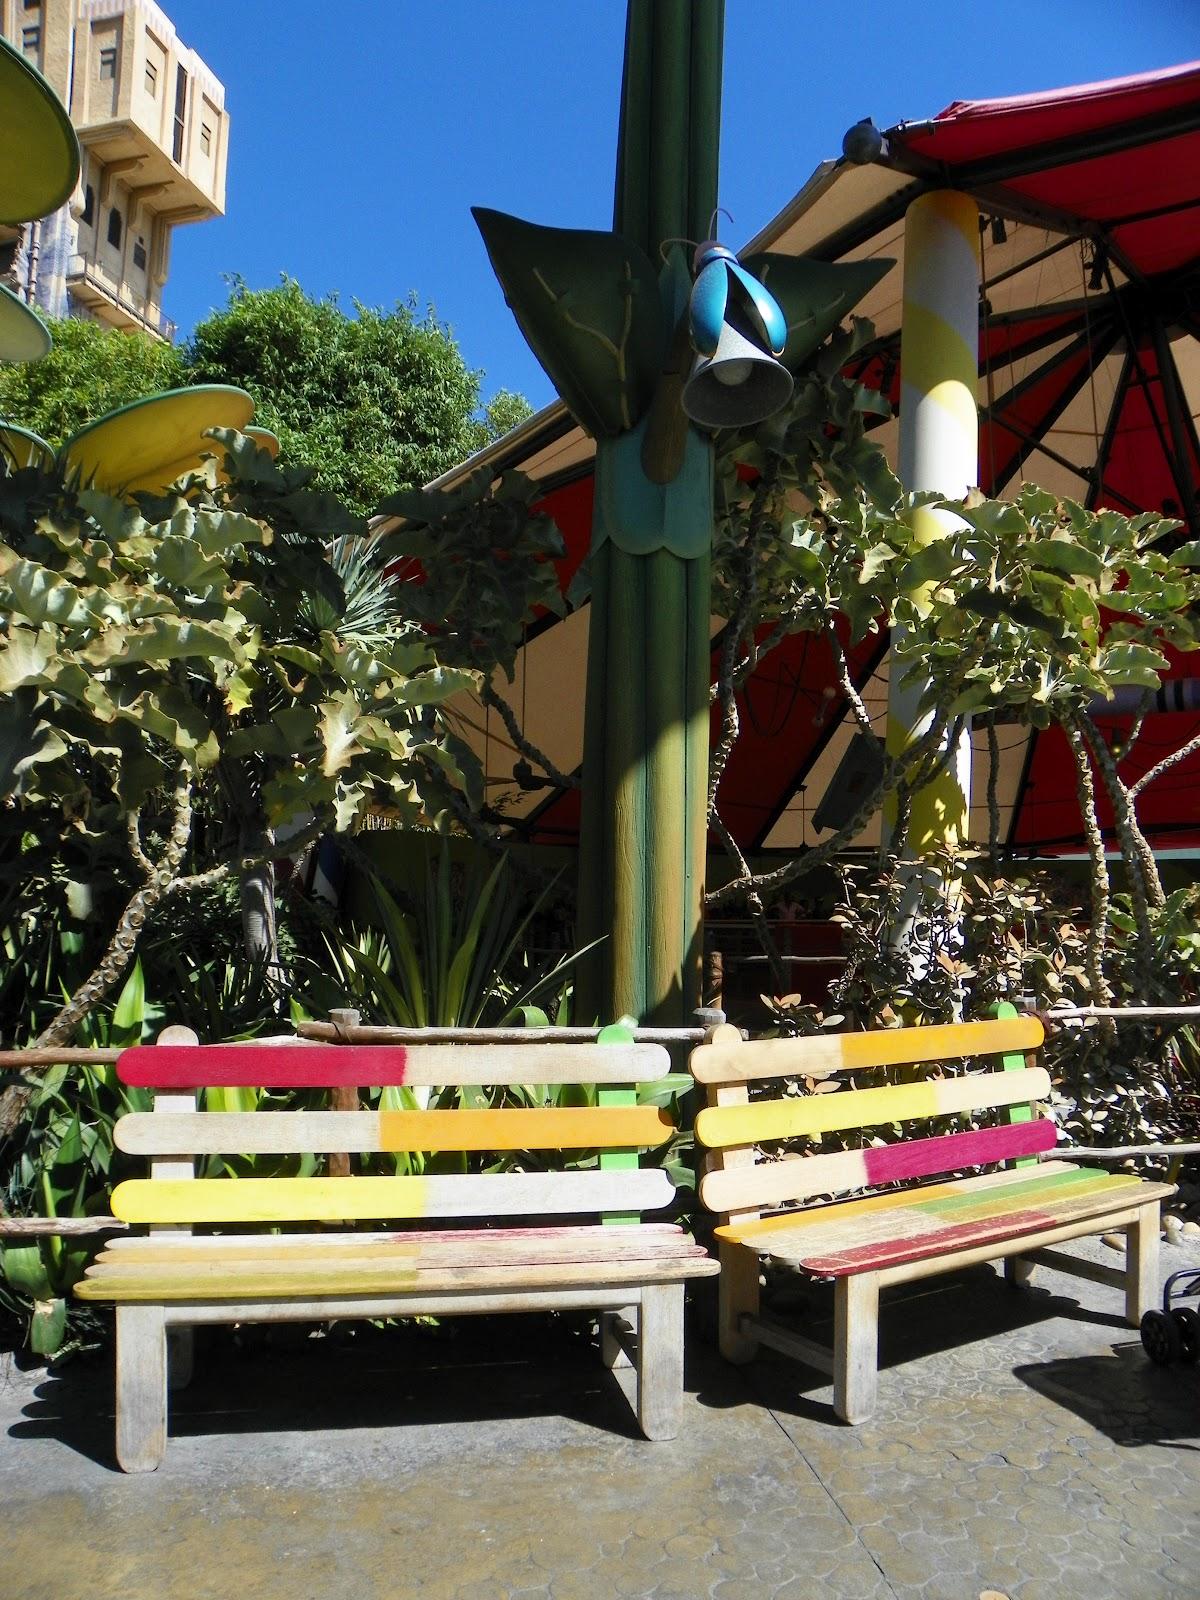 Pixie Pranks And Disney Fun Benches At Disneyland Resort